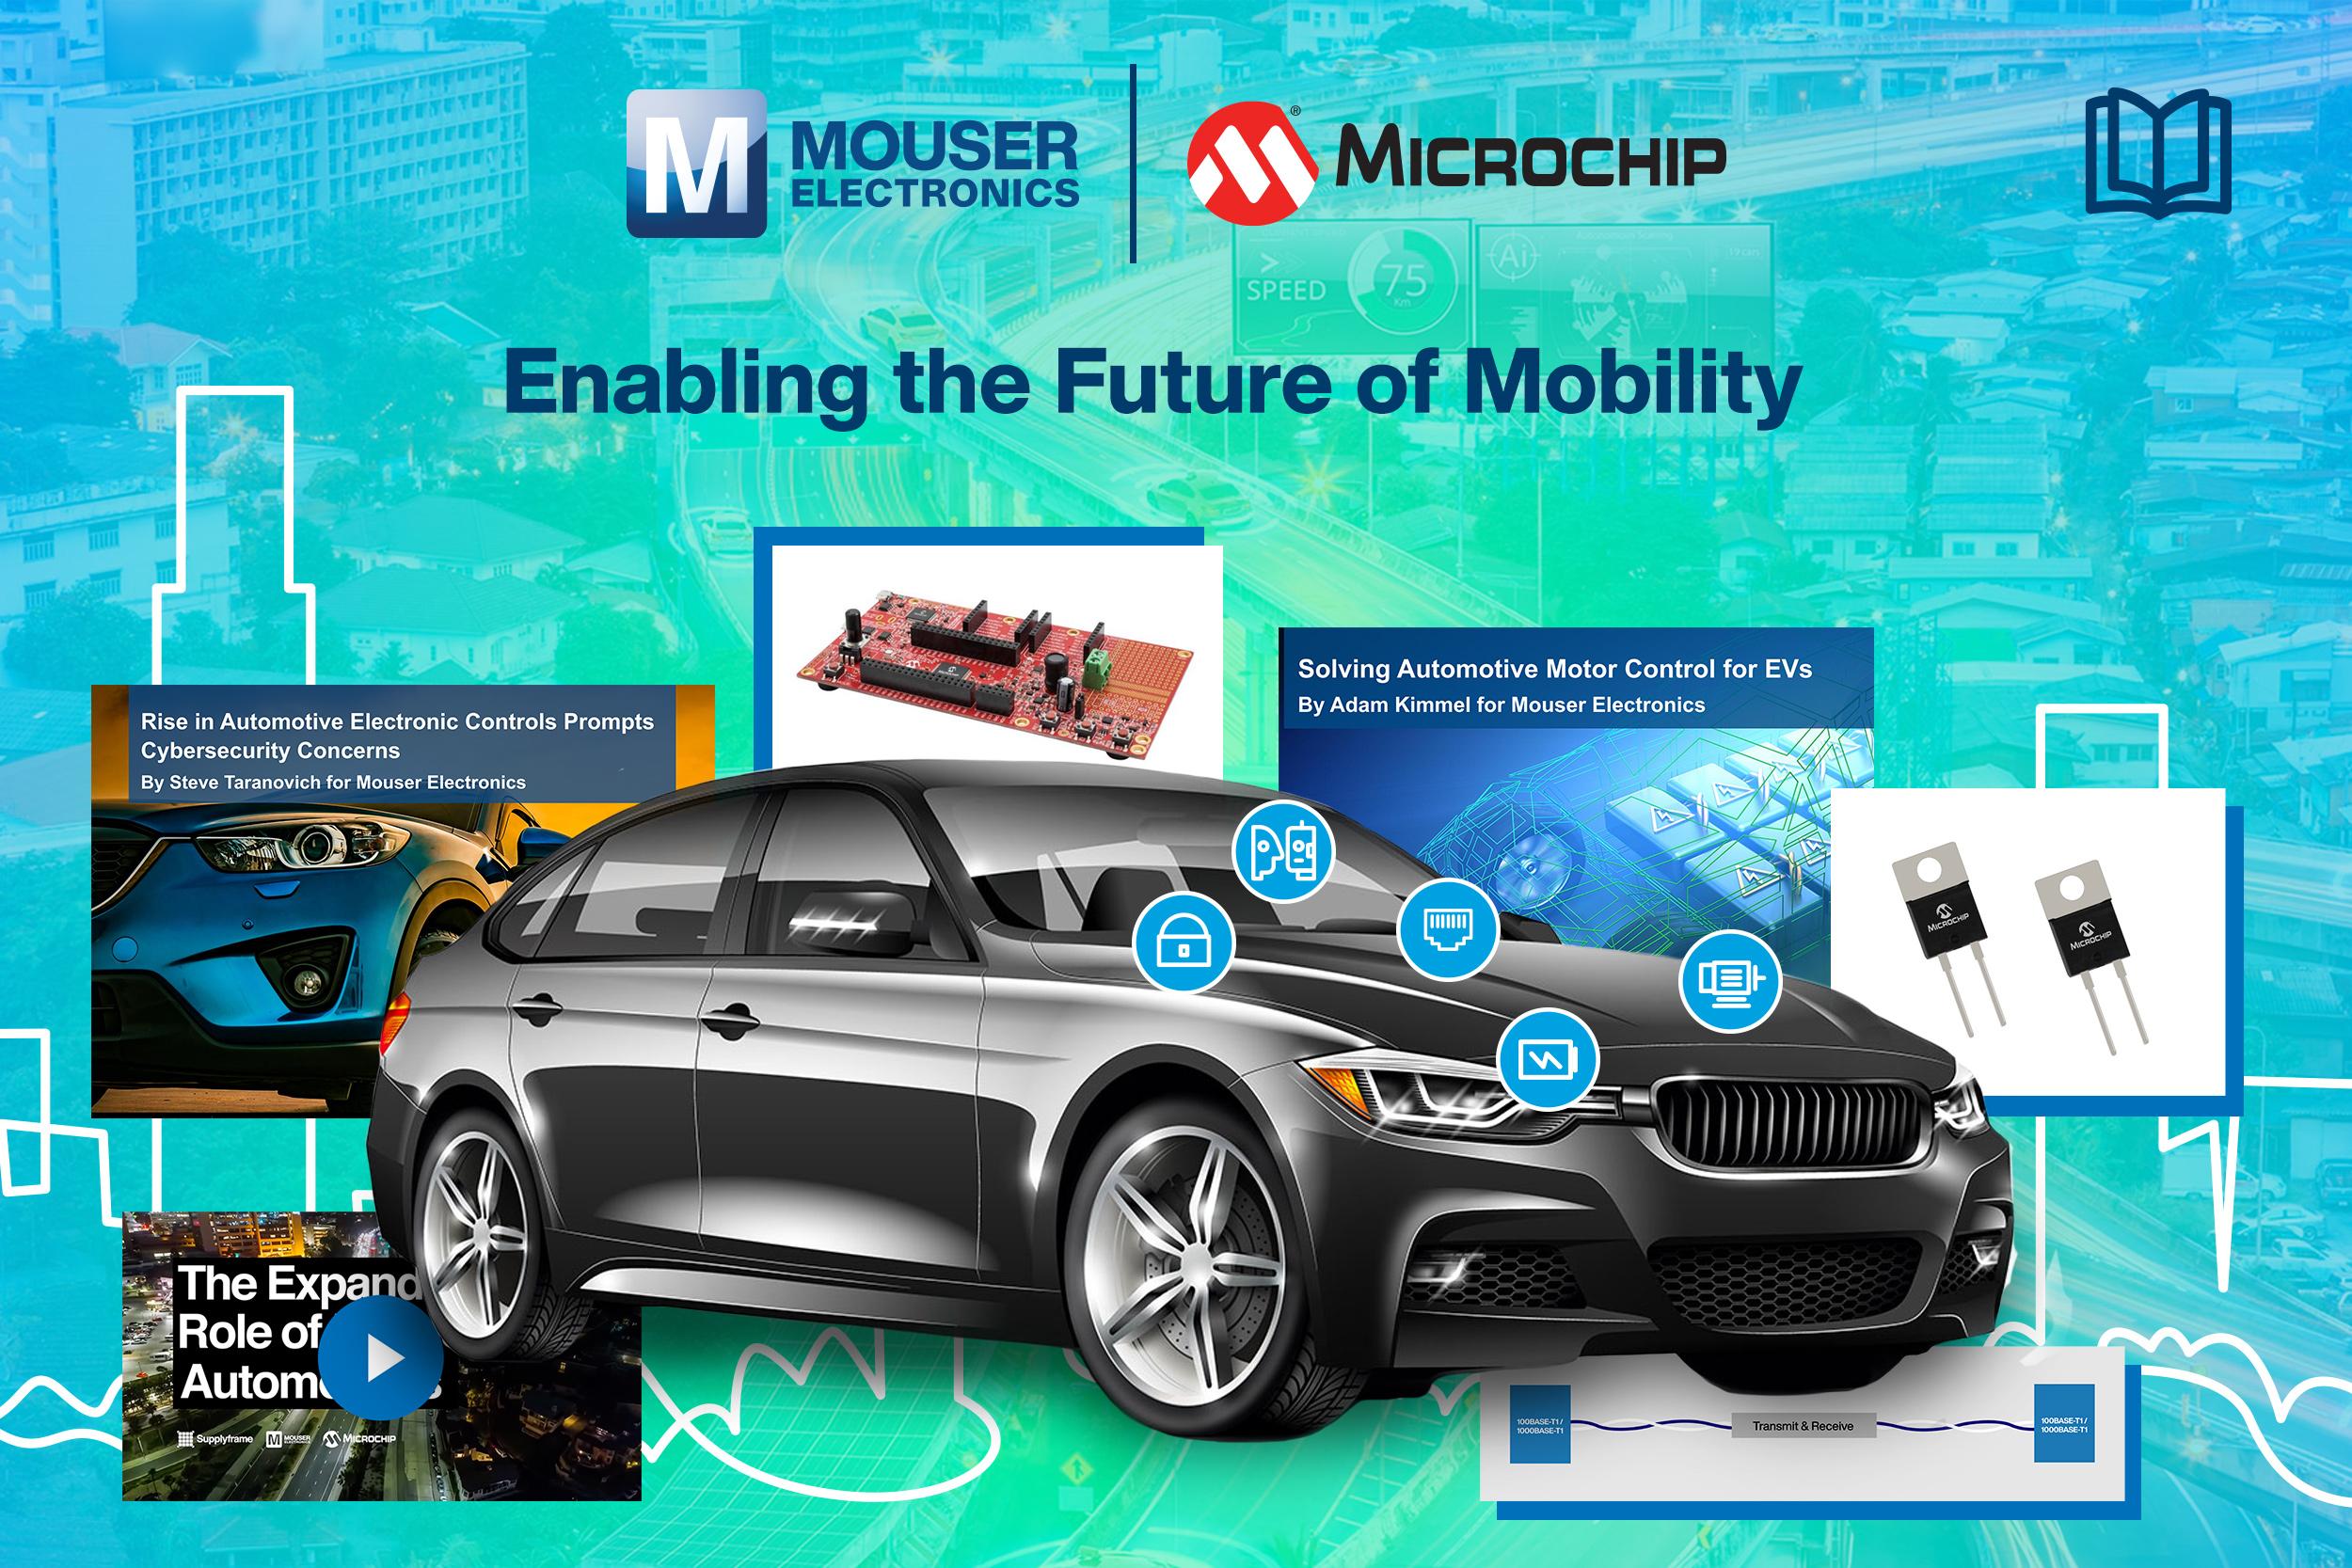 Microchip与贸泽合作推出新电子书  探索未来的汽车设计与制造